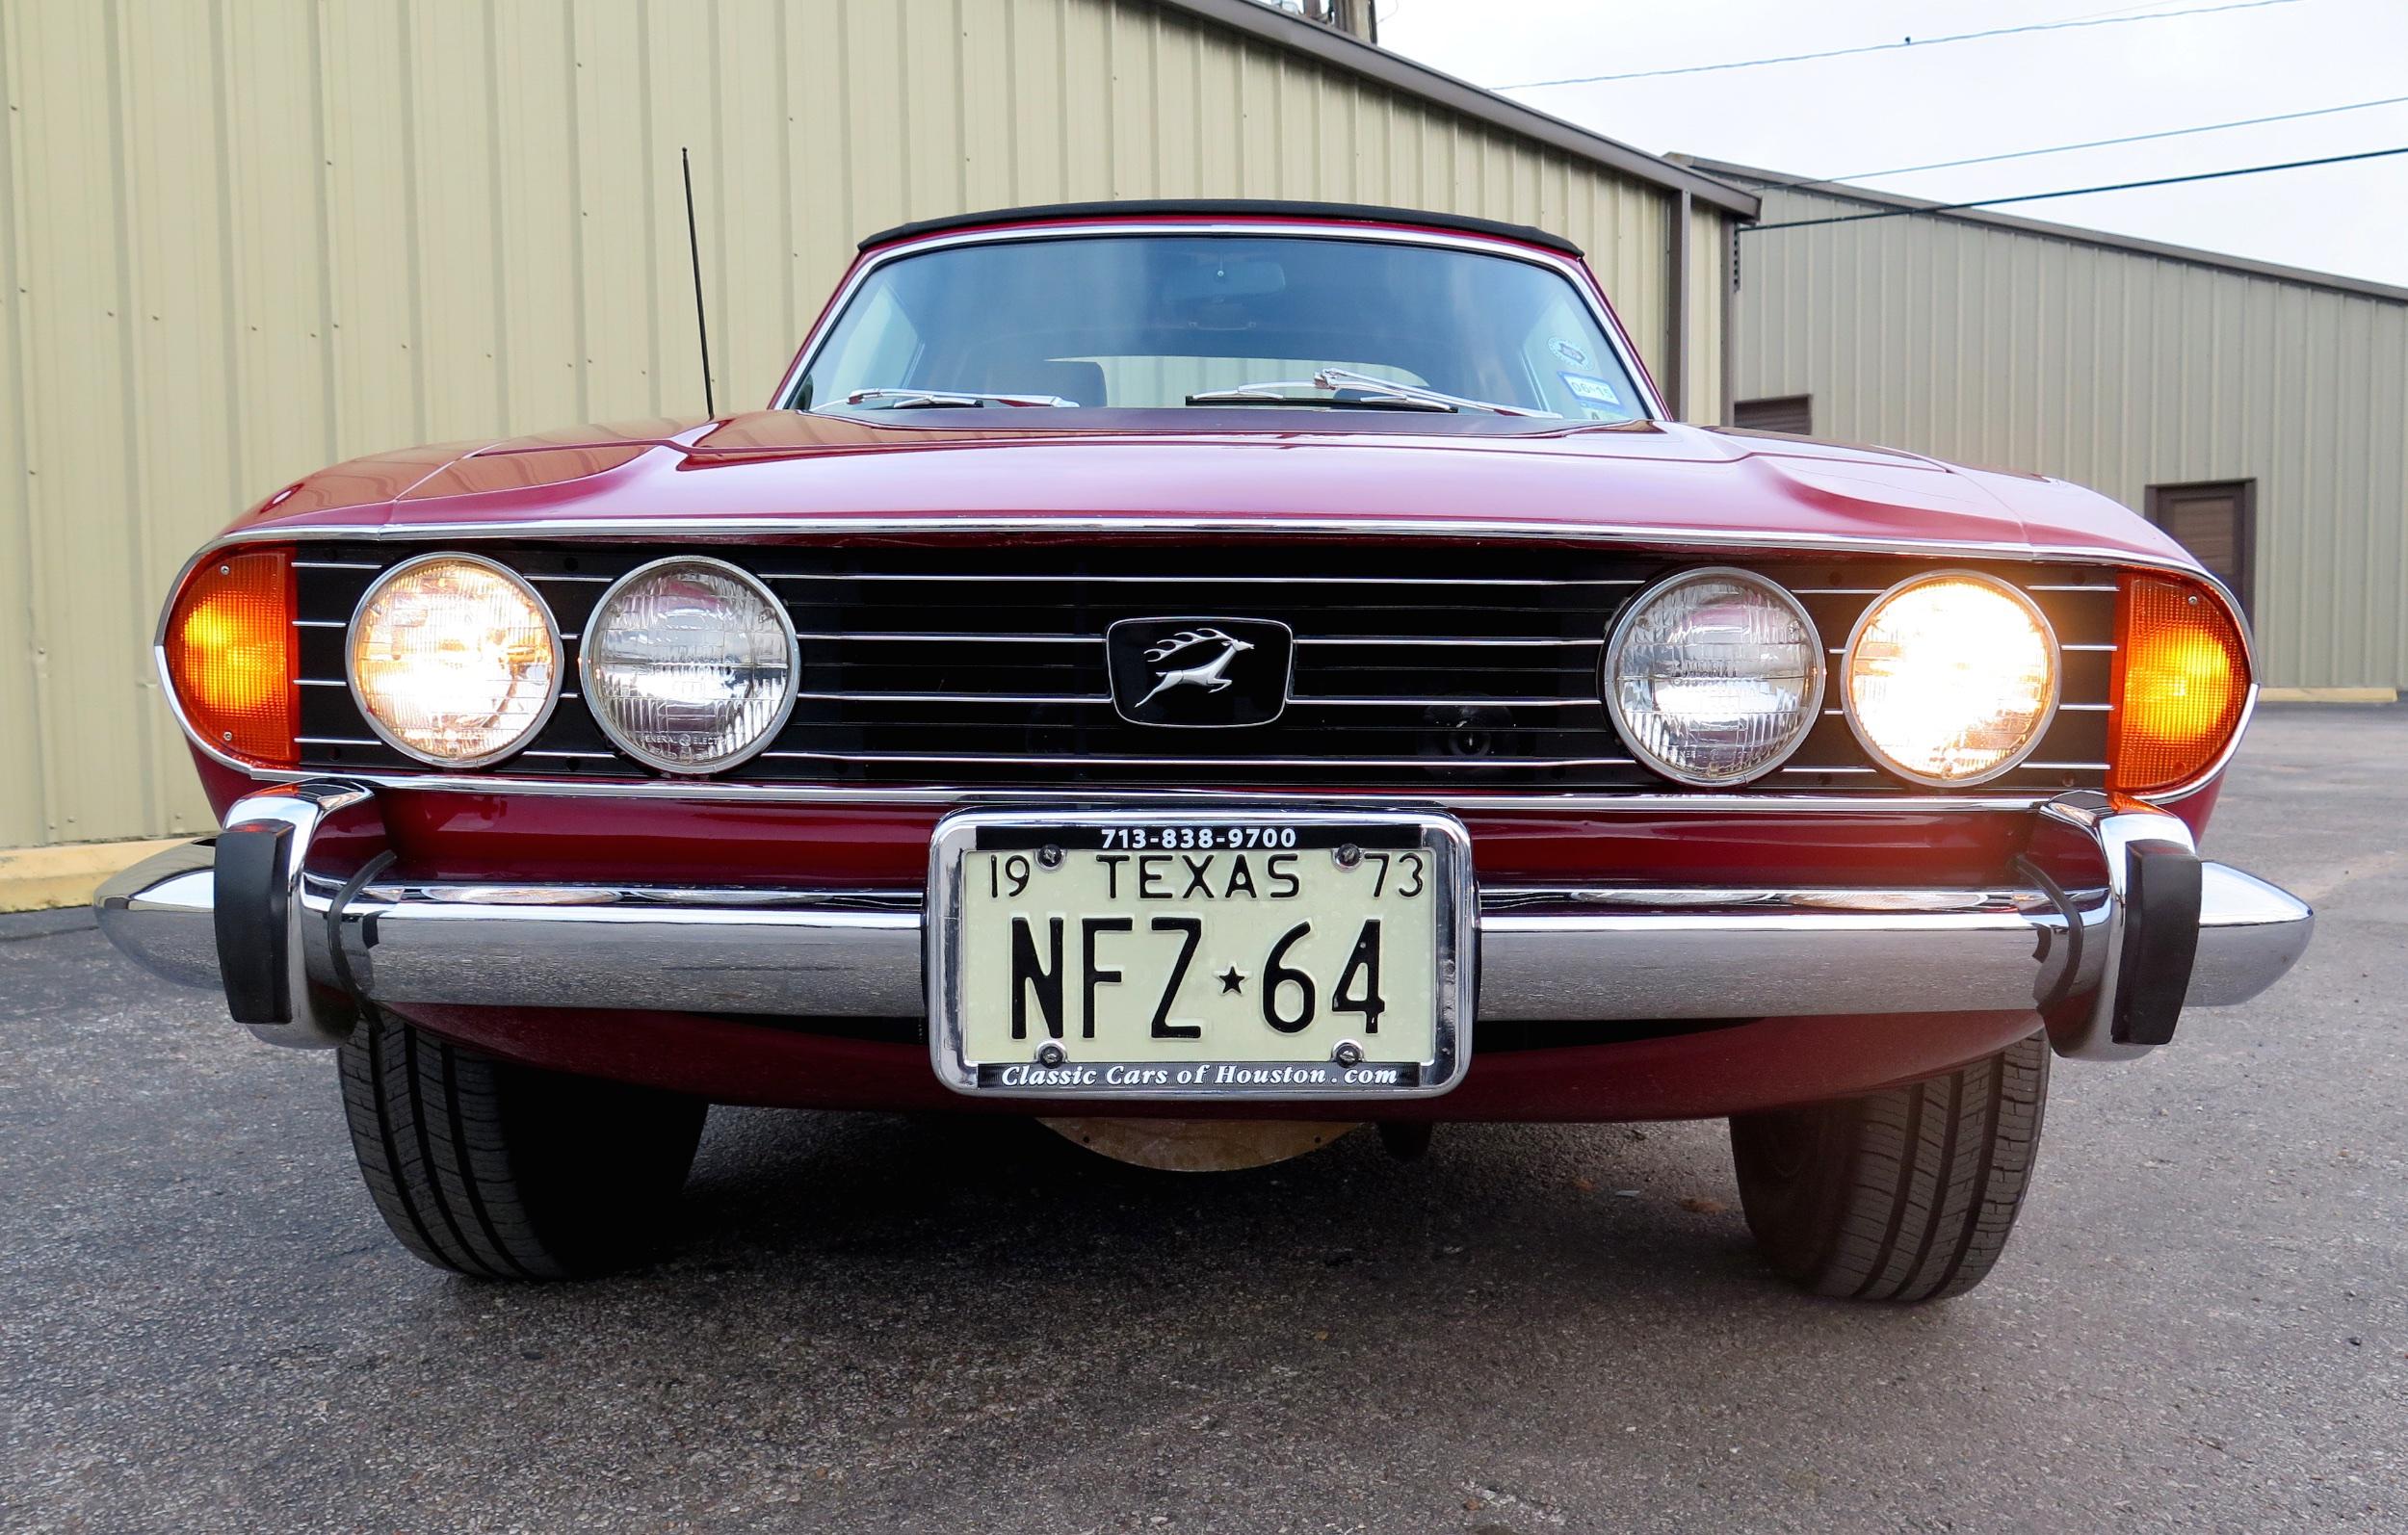 010_1973_Triumph_Stag-IMG_4993.jpg